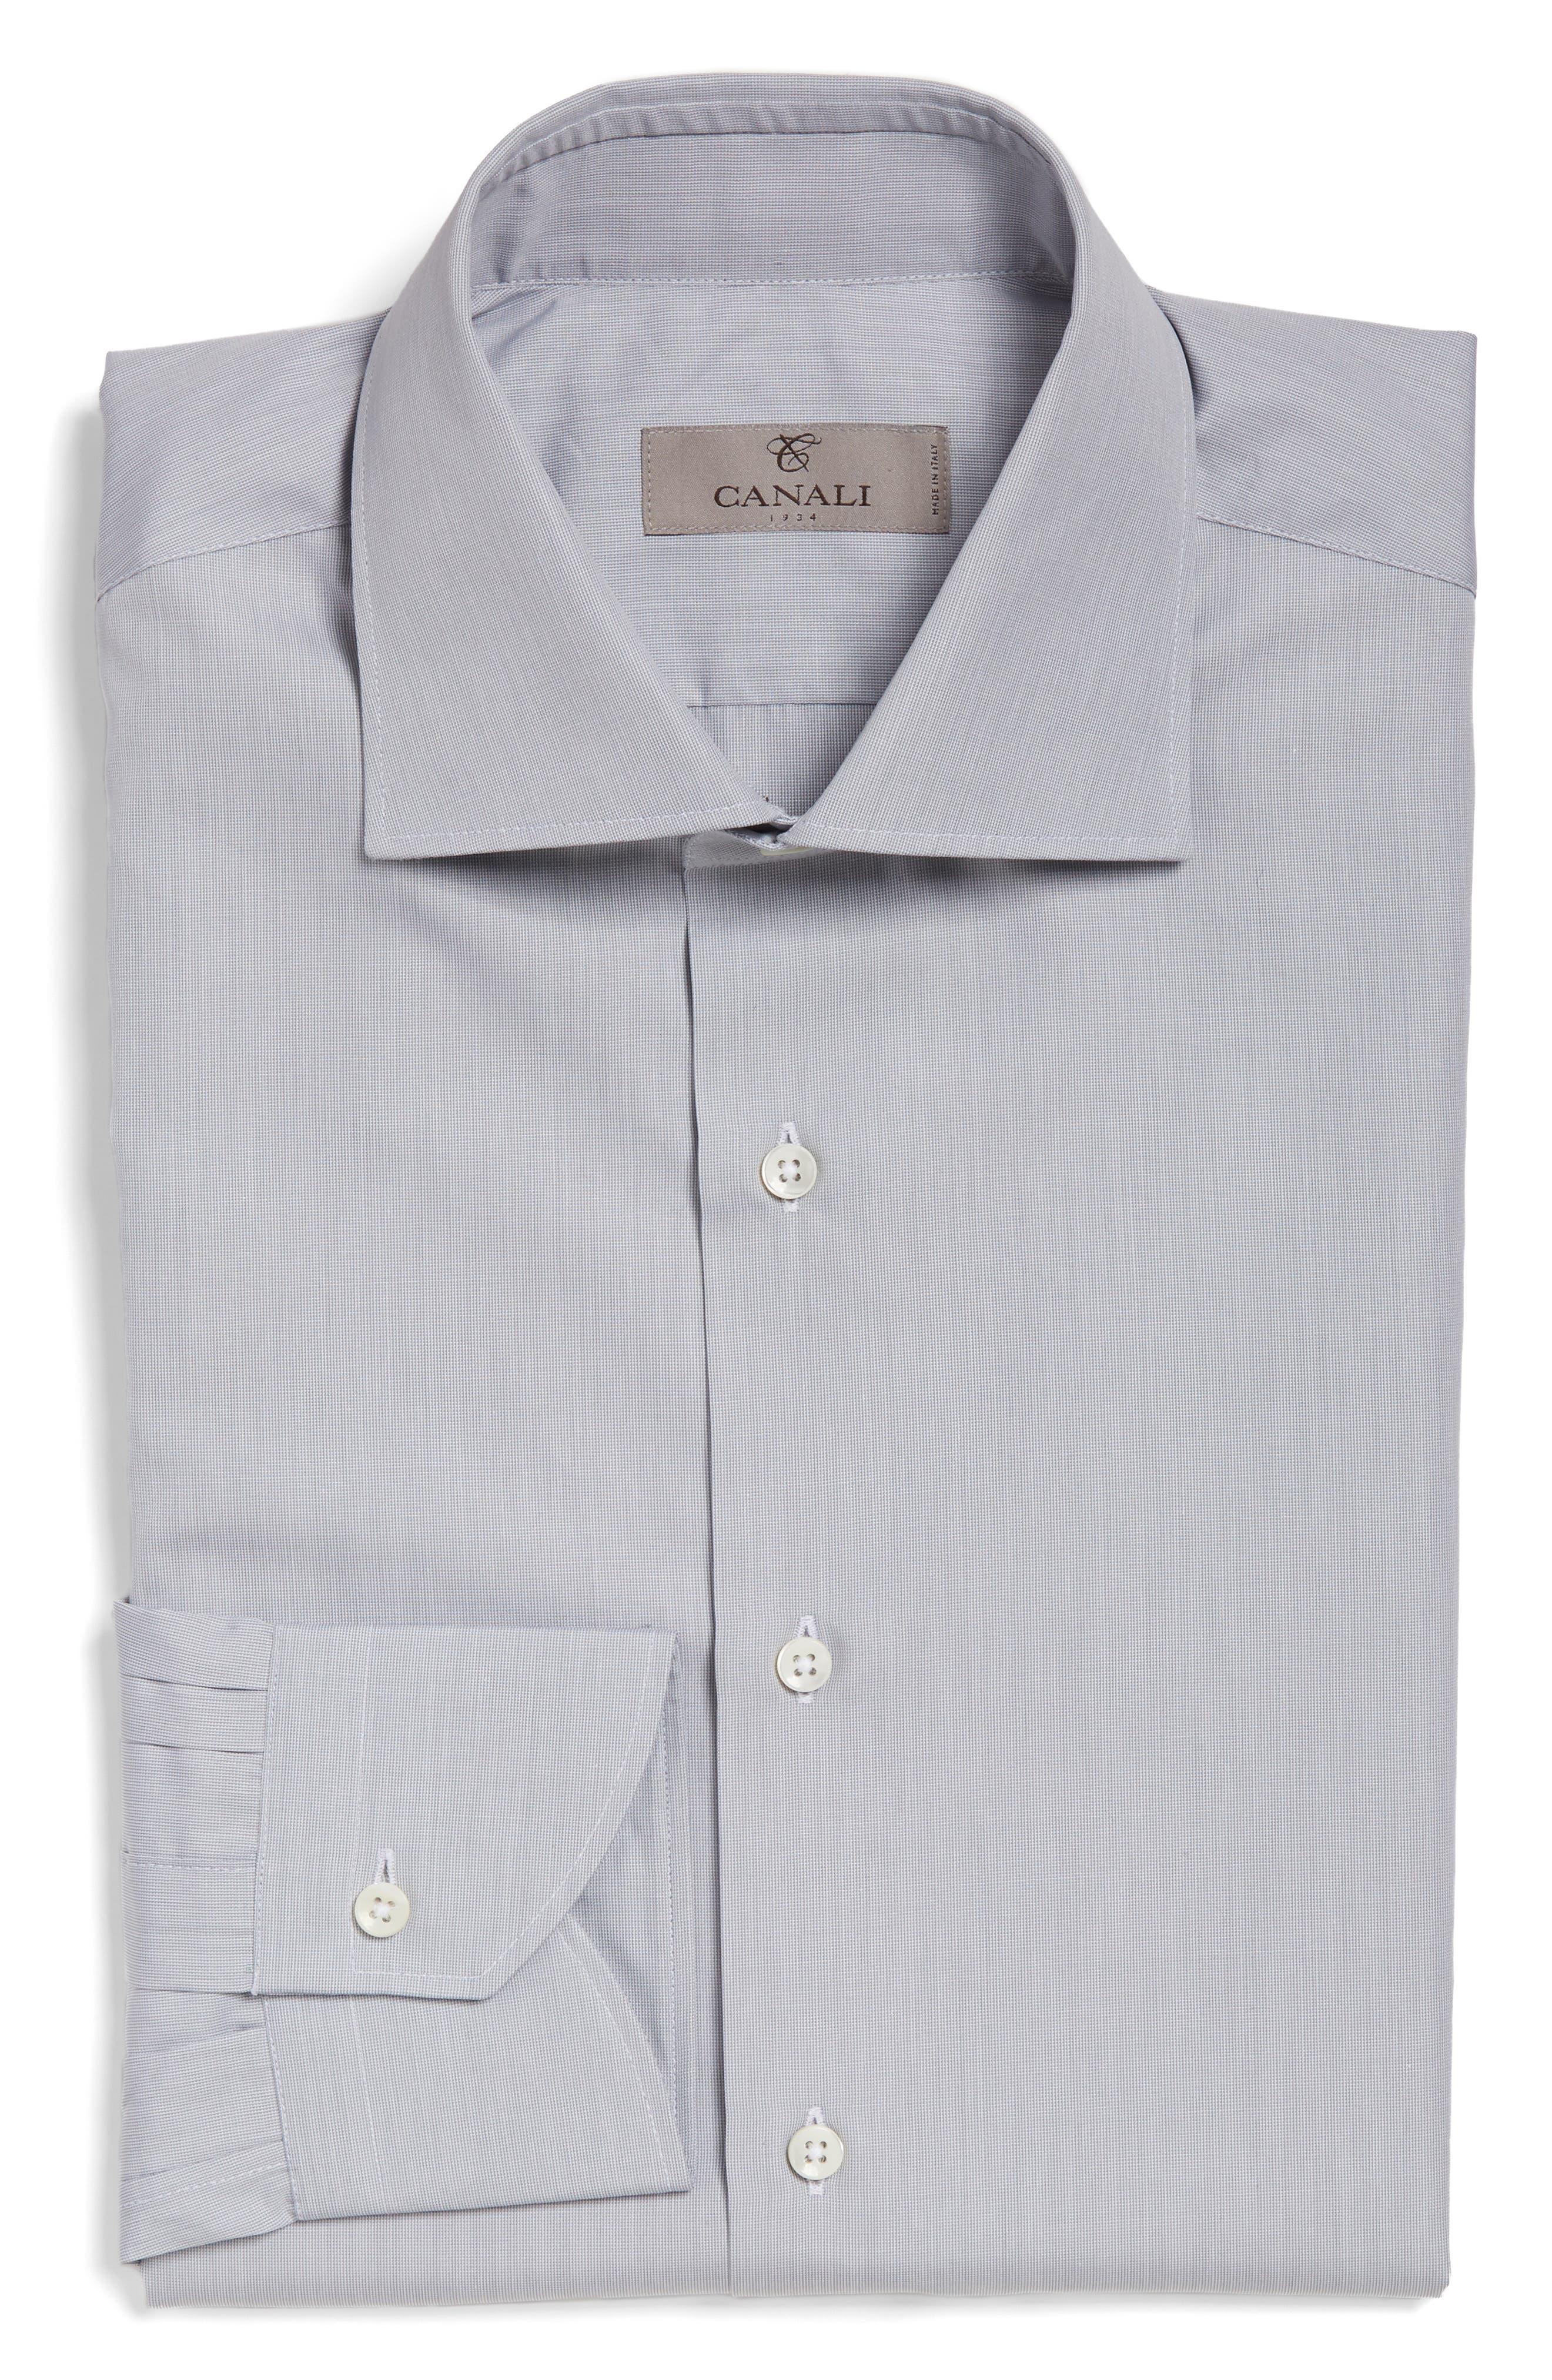 Canali Regular Fit Solid Dress Shirt